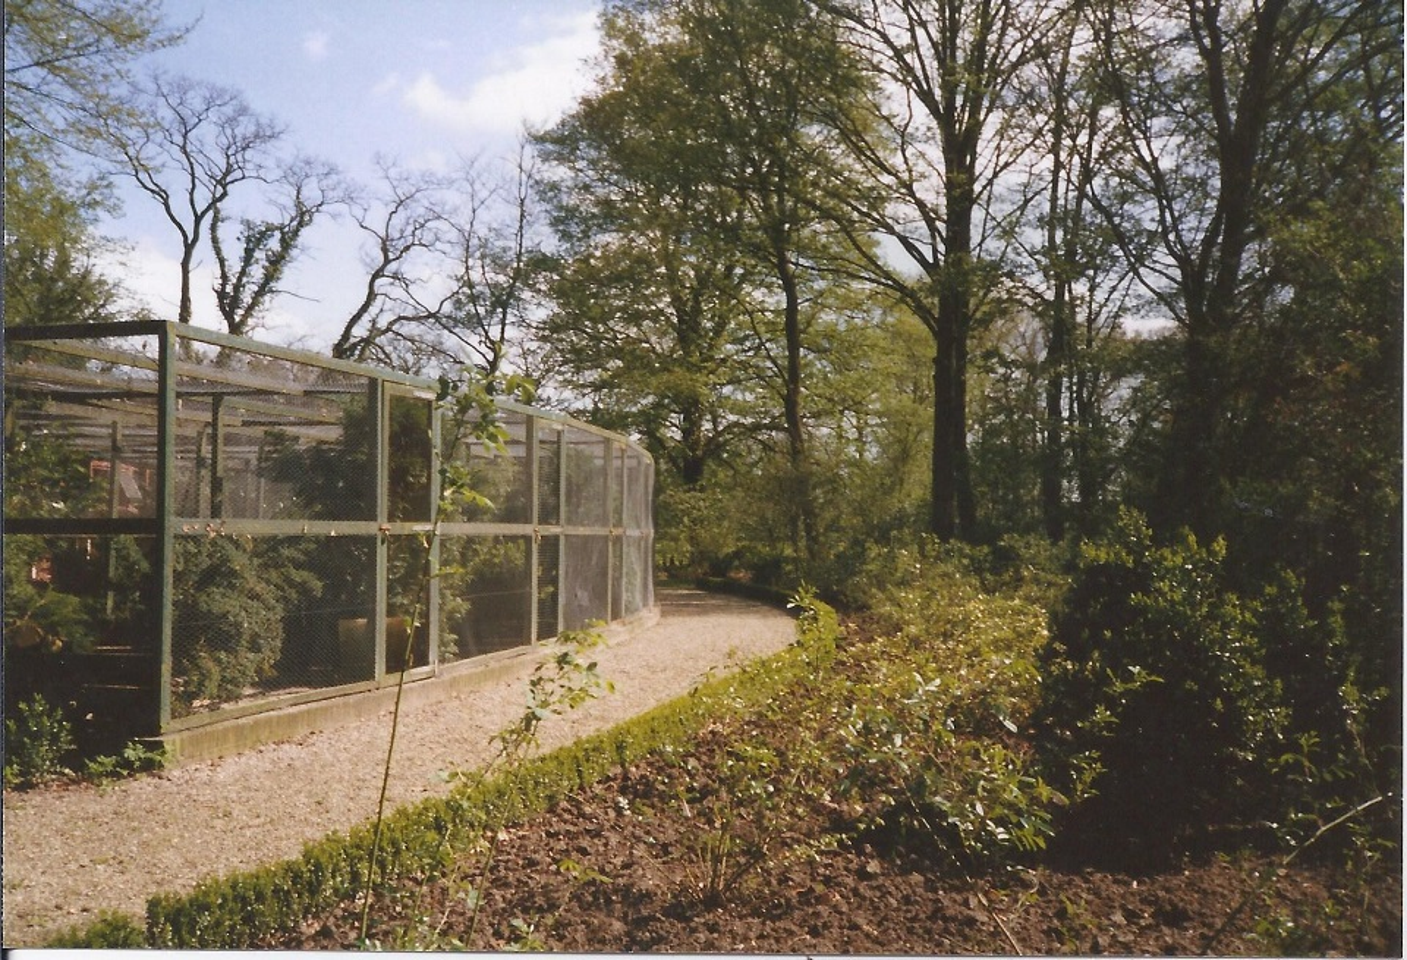 Stichting Nyenrode Fonds - Menagerie - Fazanterie, historische foto 1988 (2)